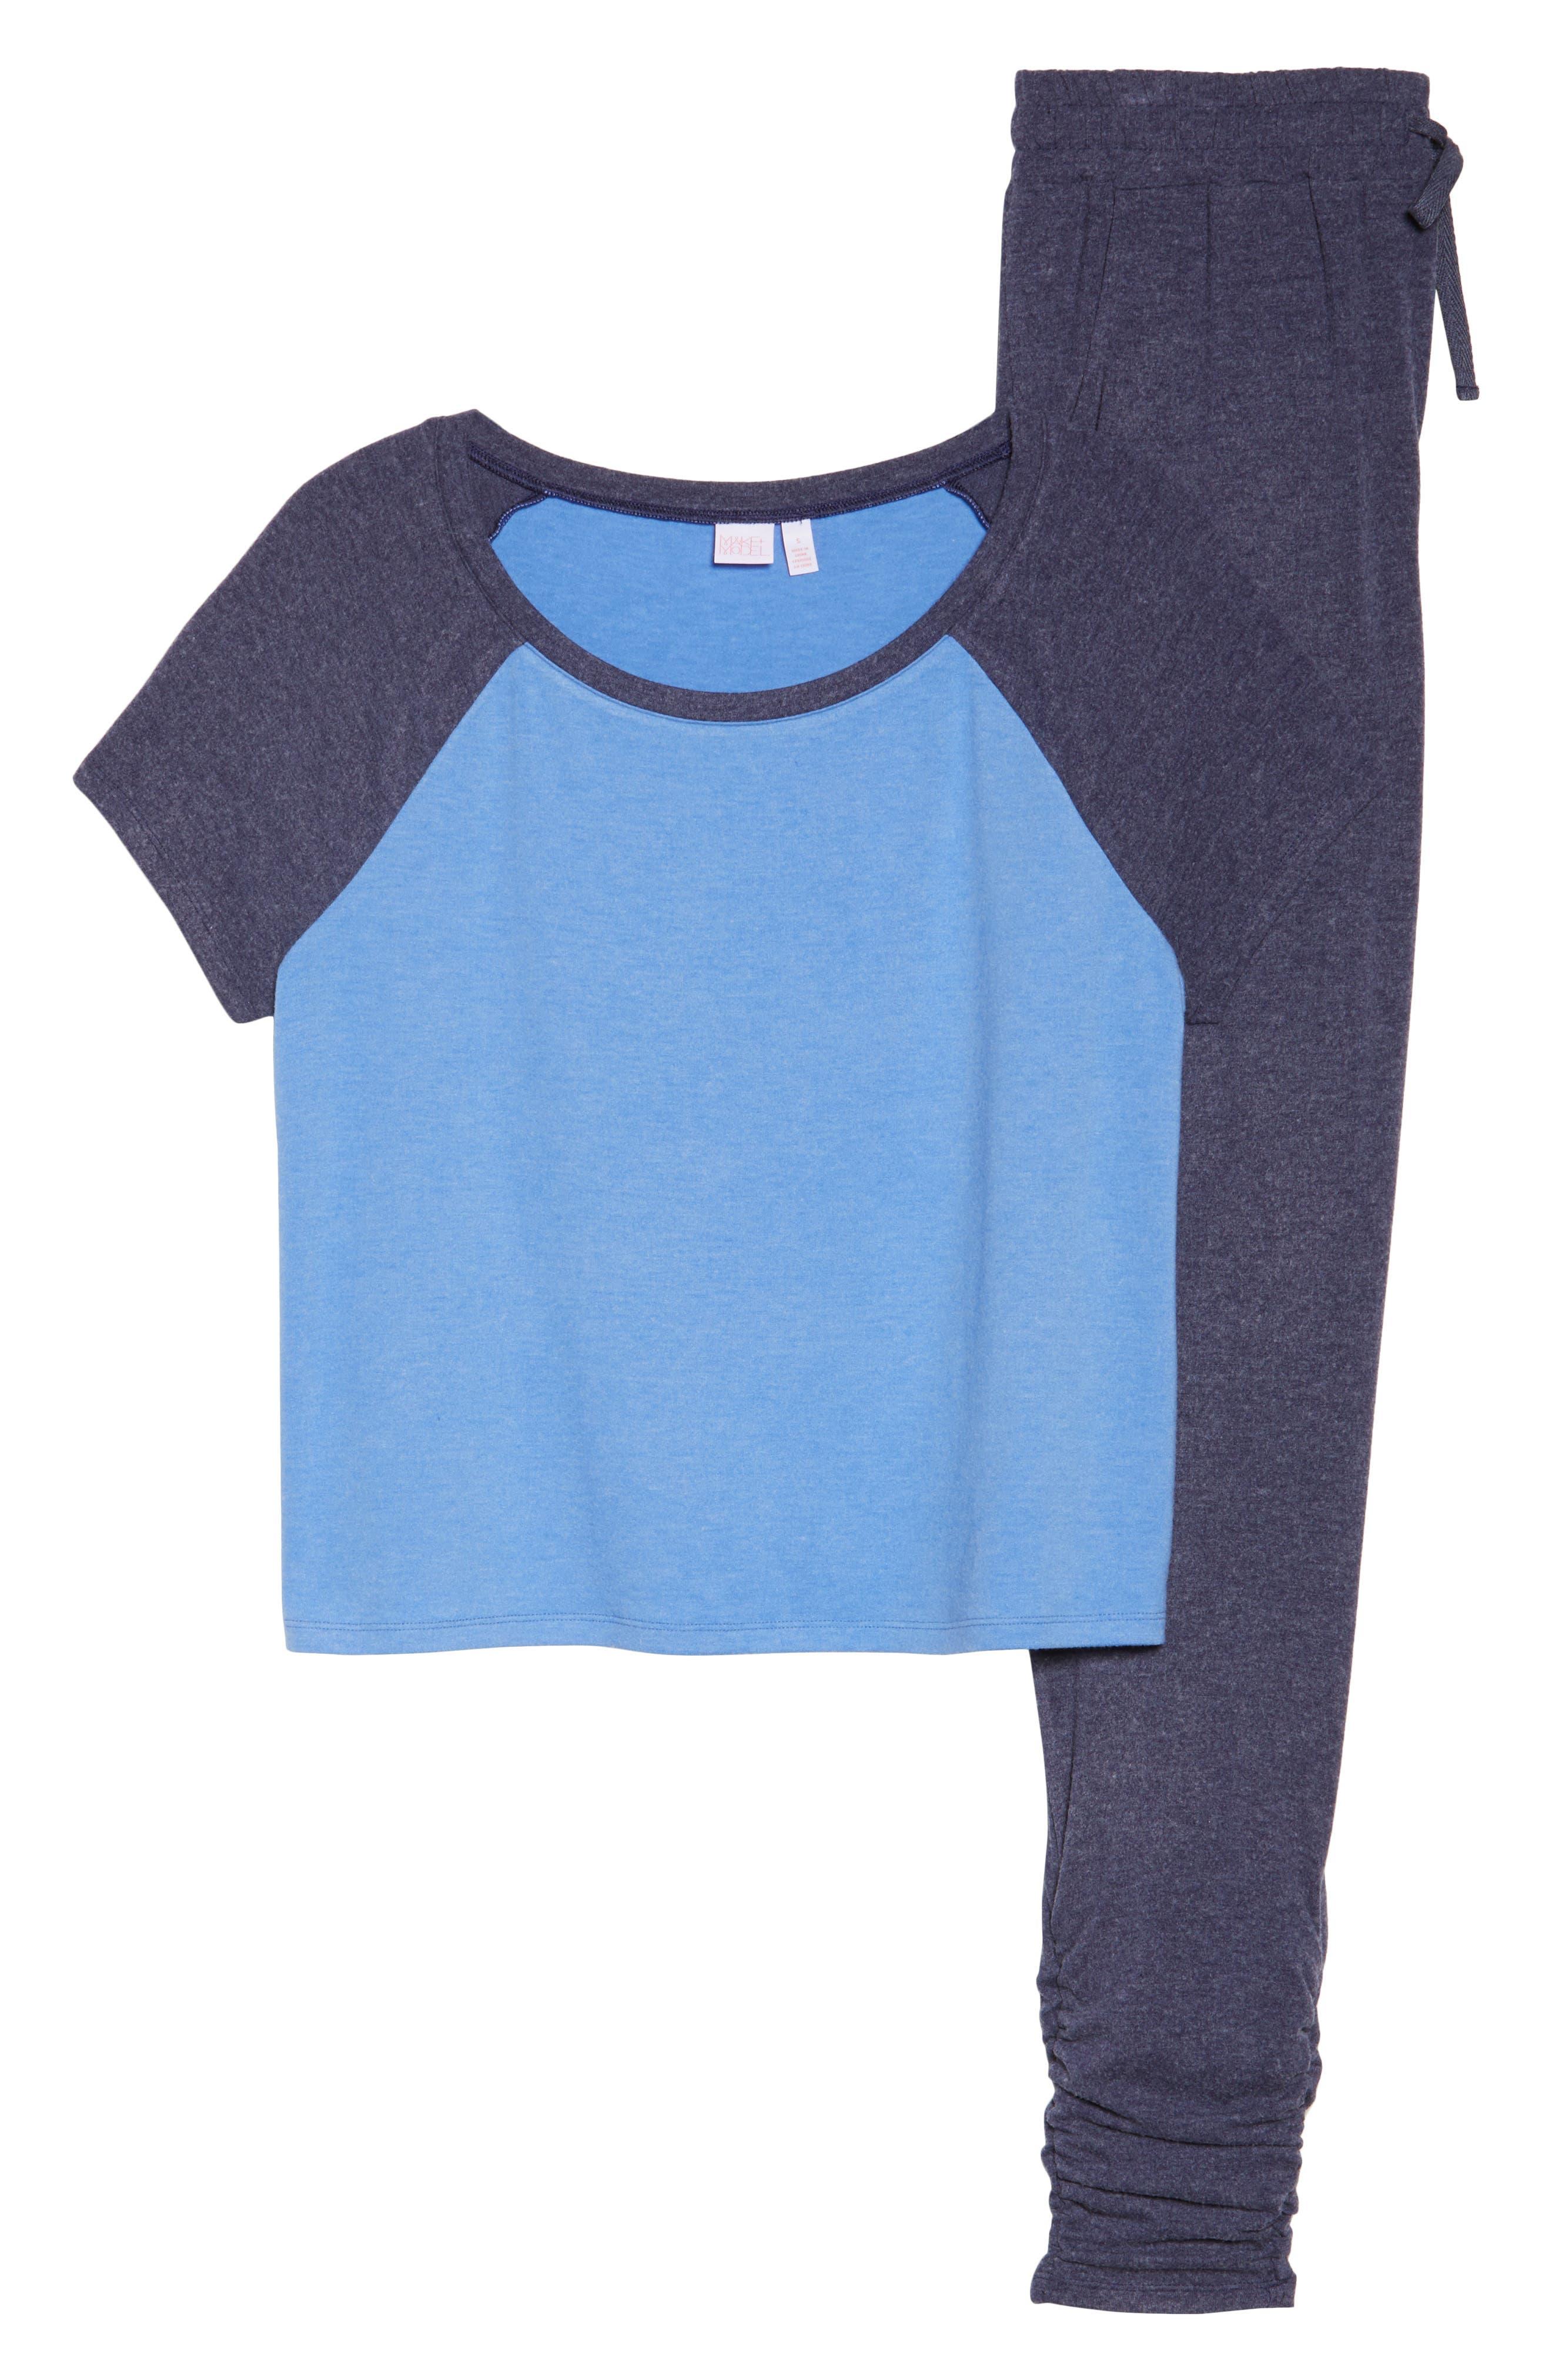 Cloud 9 Pajamas,                             Alternate thumbnail 4, color,                             Blue Azurite